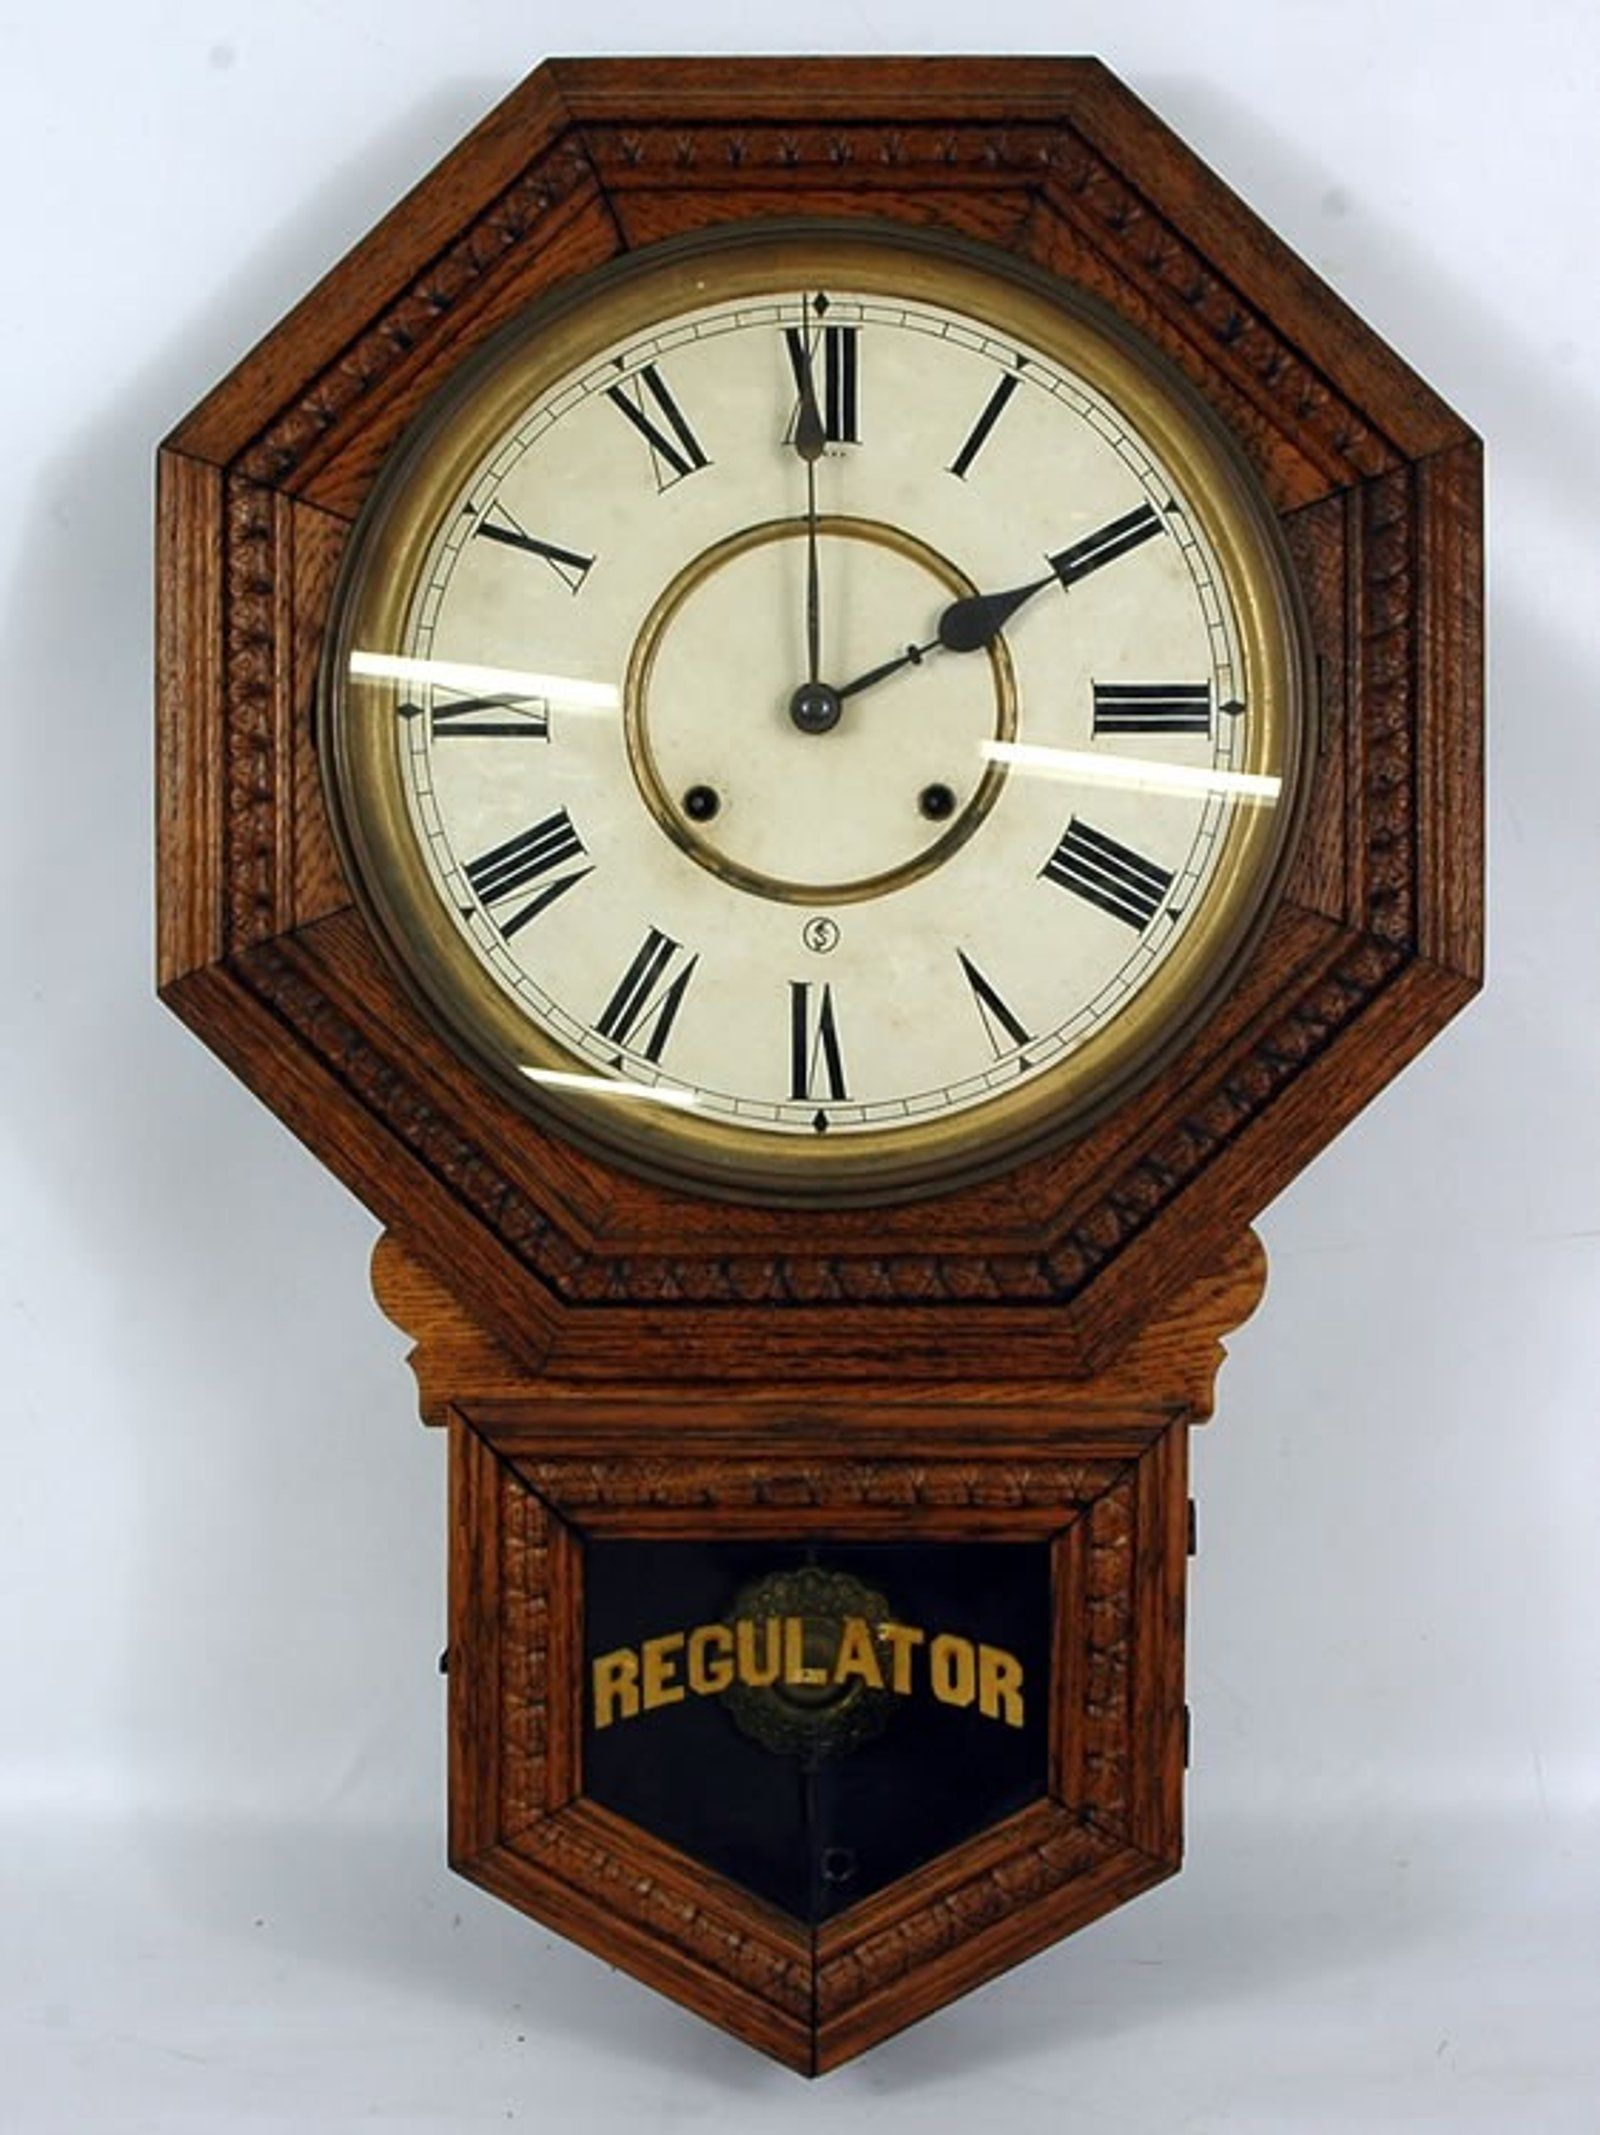 131 Sessions Oak Schoolhouse Regulator Wall Clock May 7